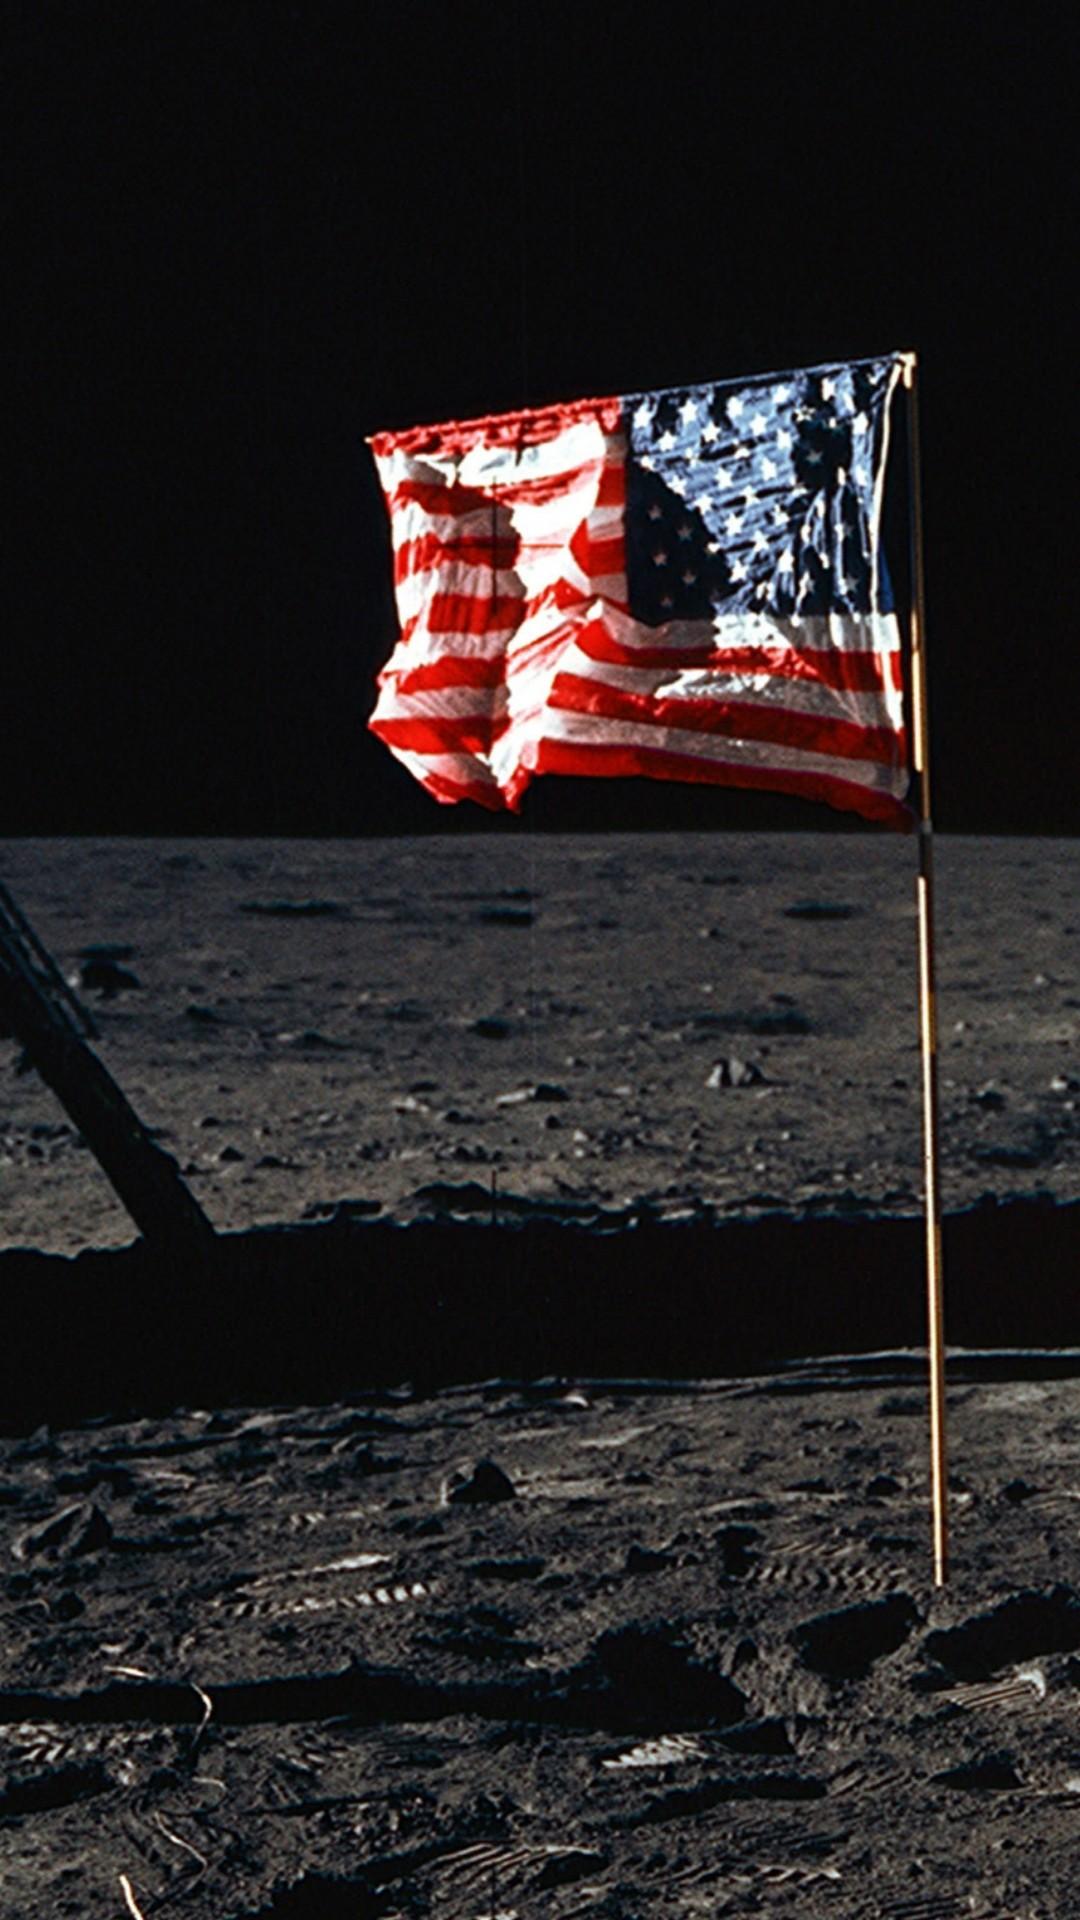 … American Flag Iphone Wallpaper American Flag Wallpaper For Iphone …